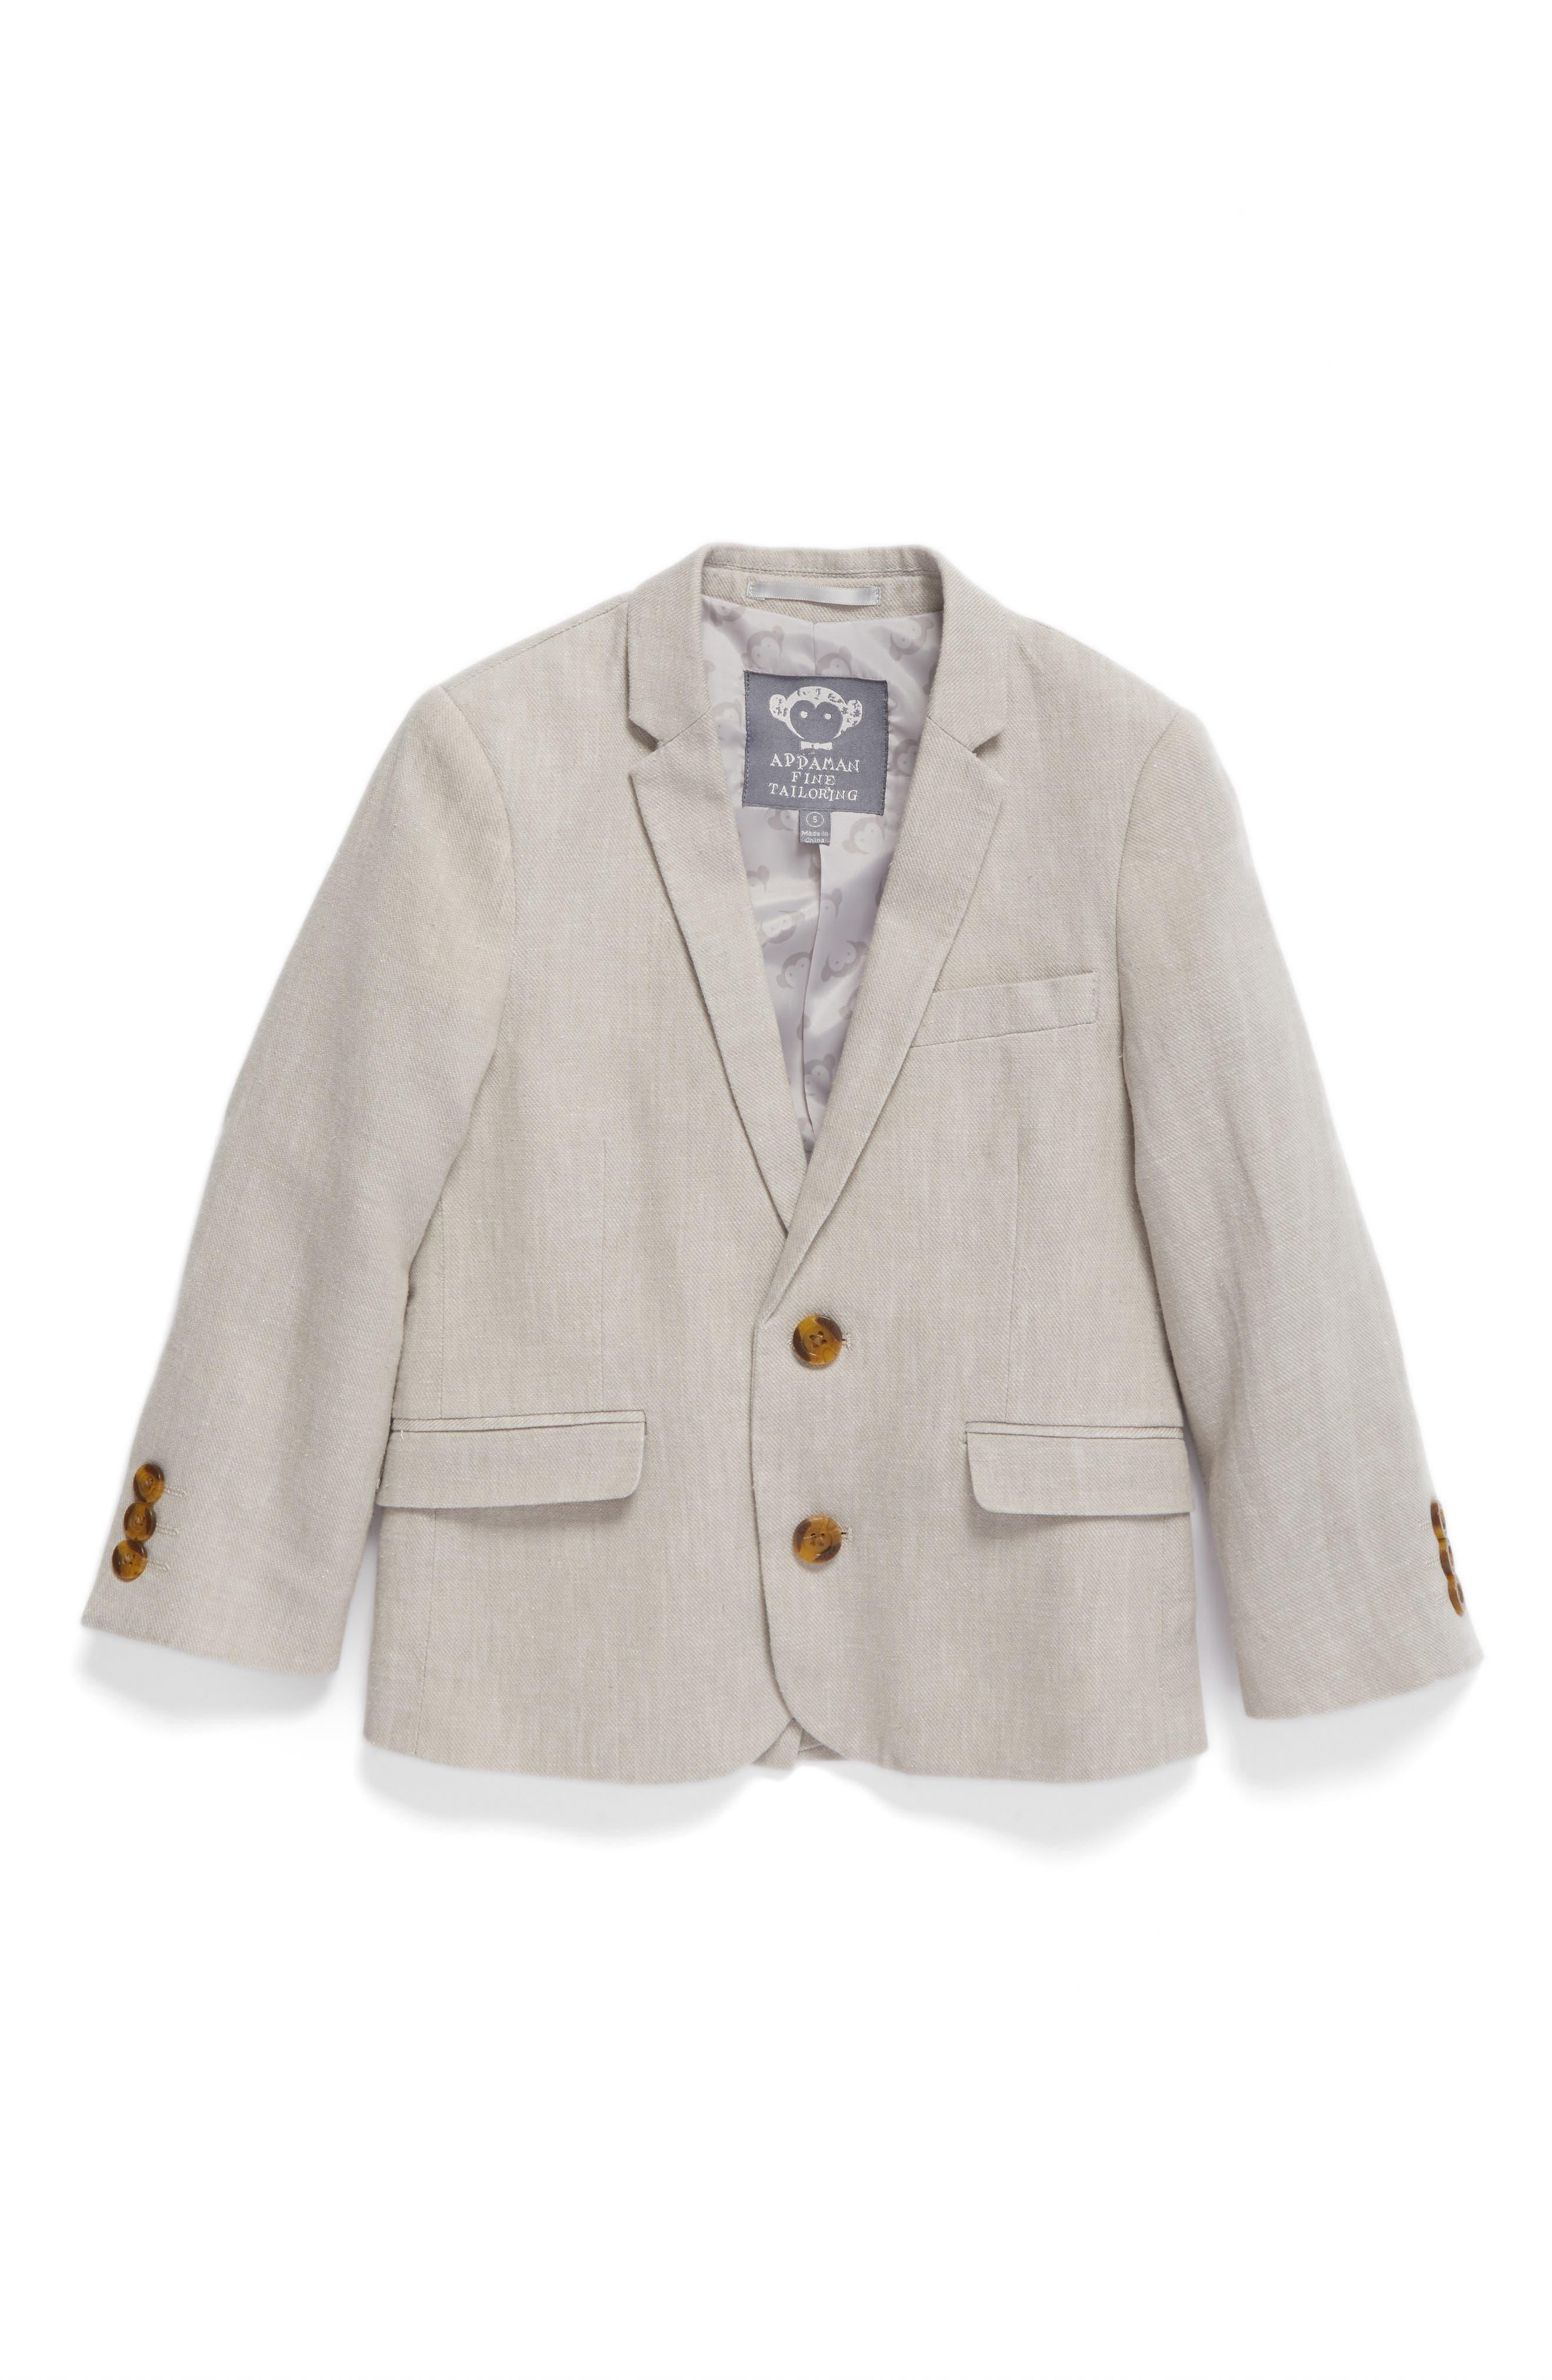 Main Image - Appaman Linen Suit Jacket (Toddler Boys, Little Boys & Big Boys)